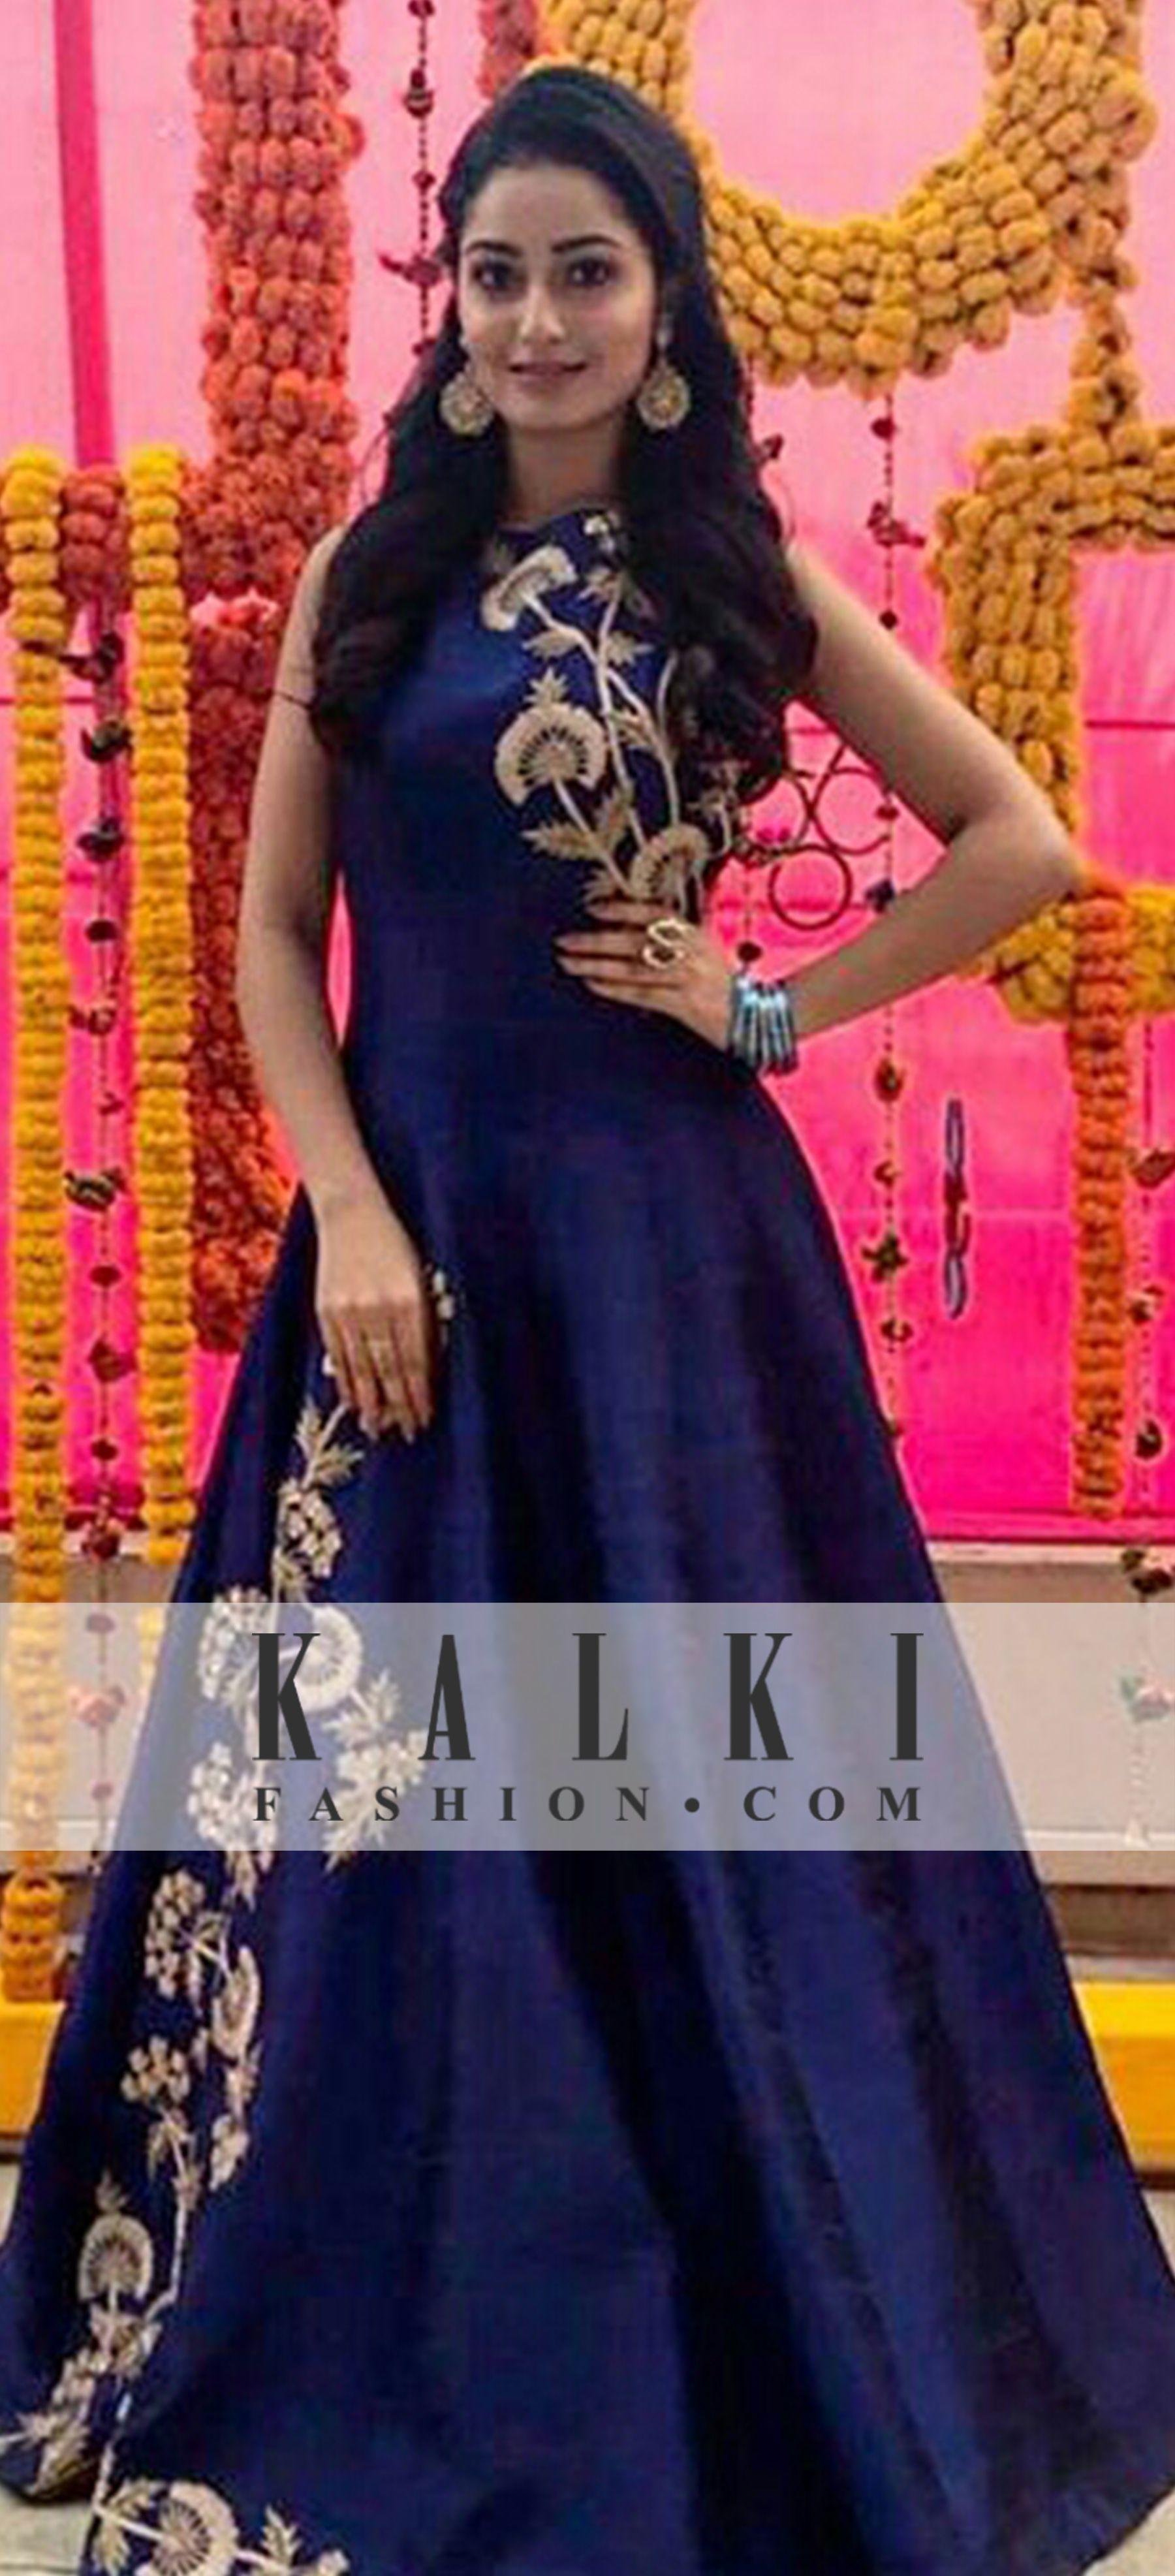 33b22ba6646d Tridha Choudhury SKU: 33660 PRICE: 32,500/- | KALKI Celebrity ...